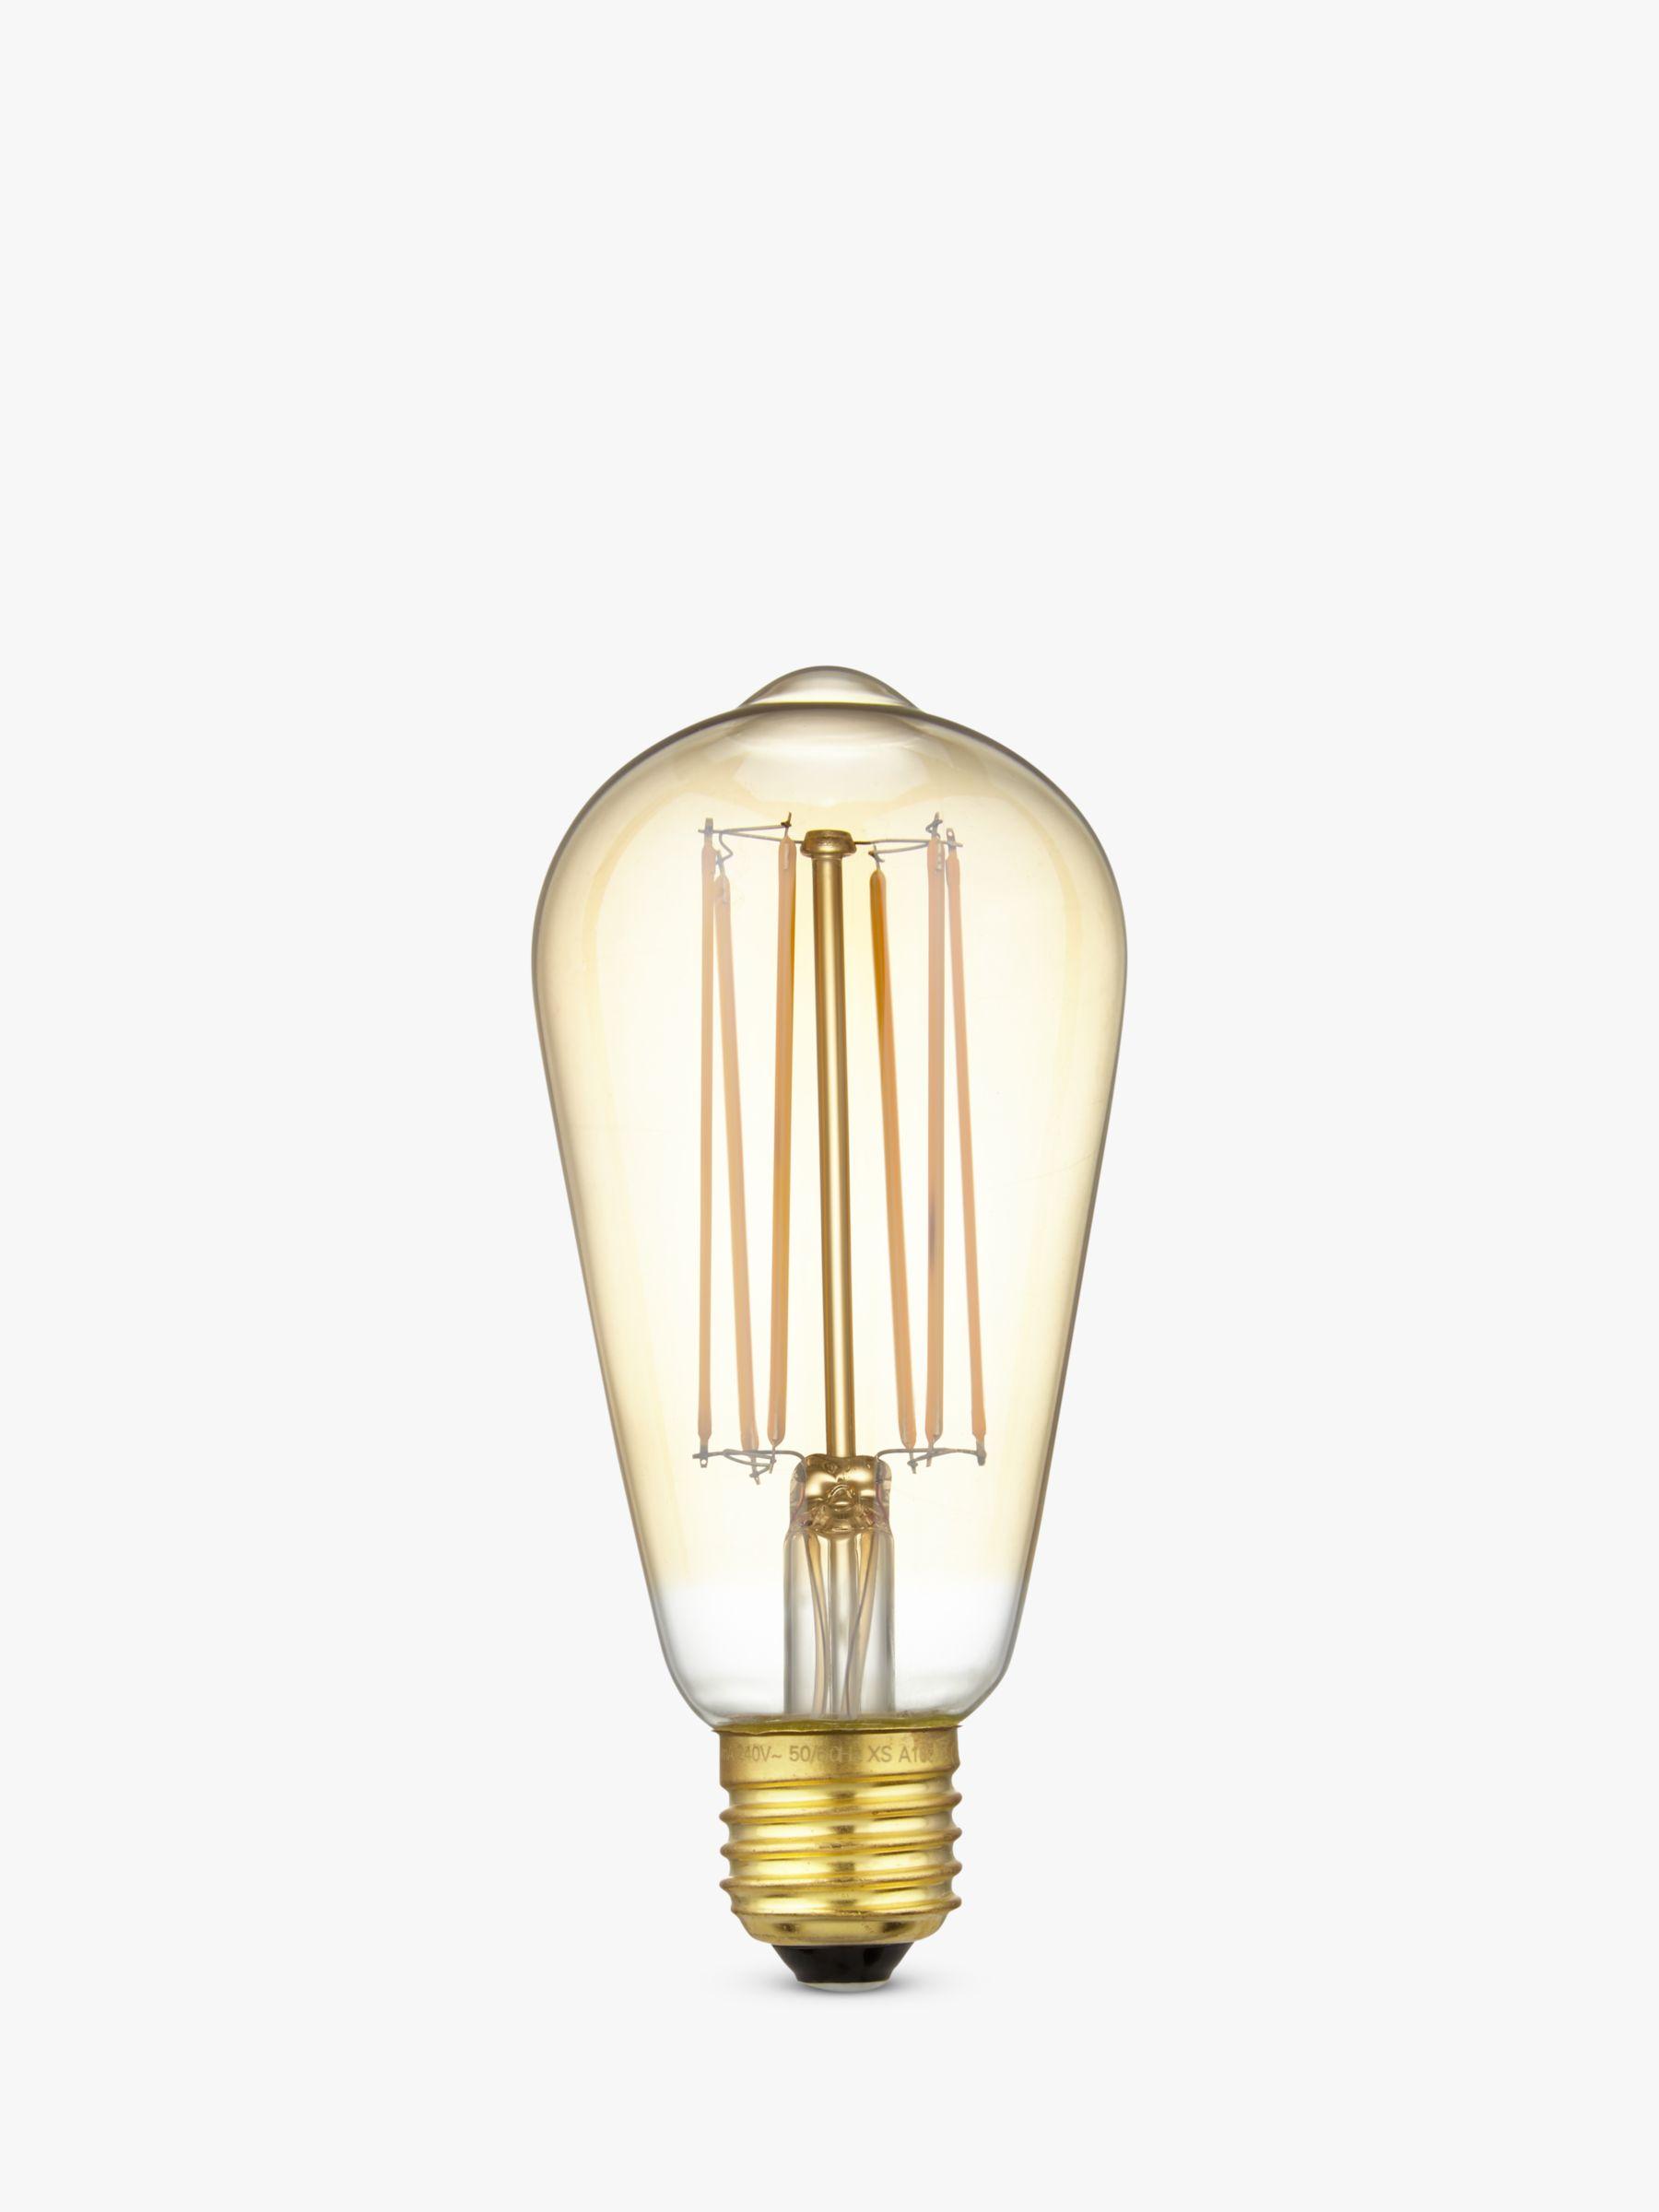 Calex Calex 4W ES LED ST64 Dimmable Rustic Filament Bulb, Gold